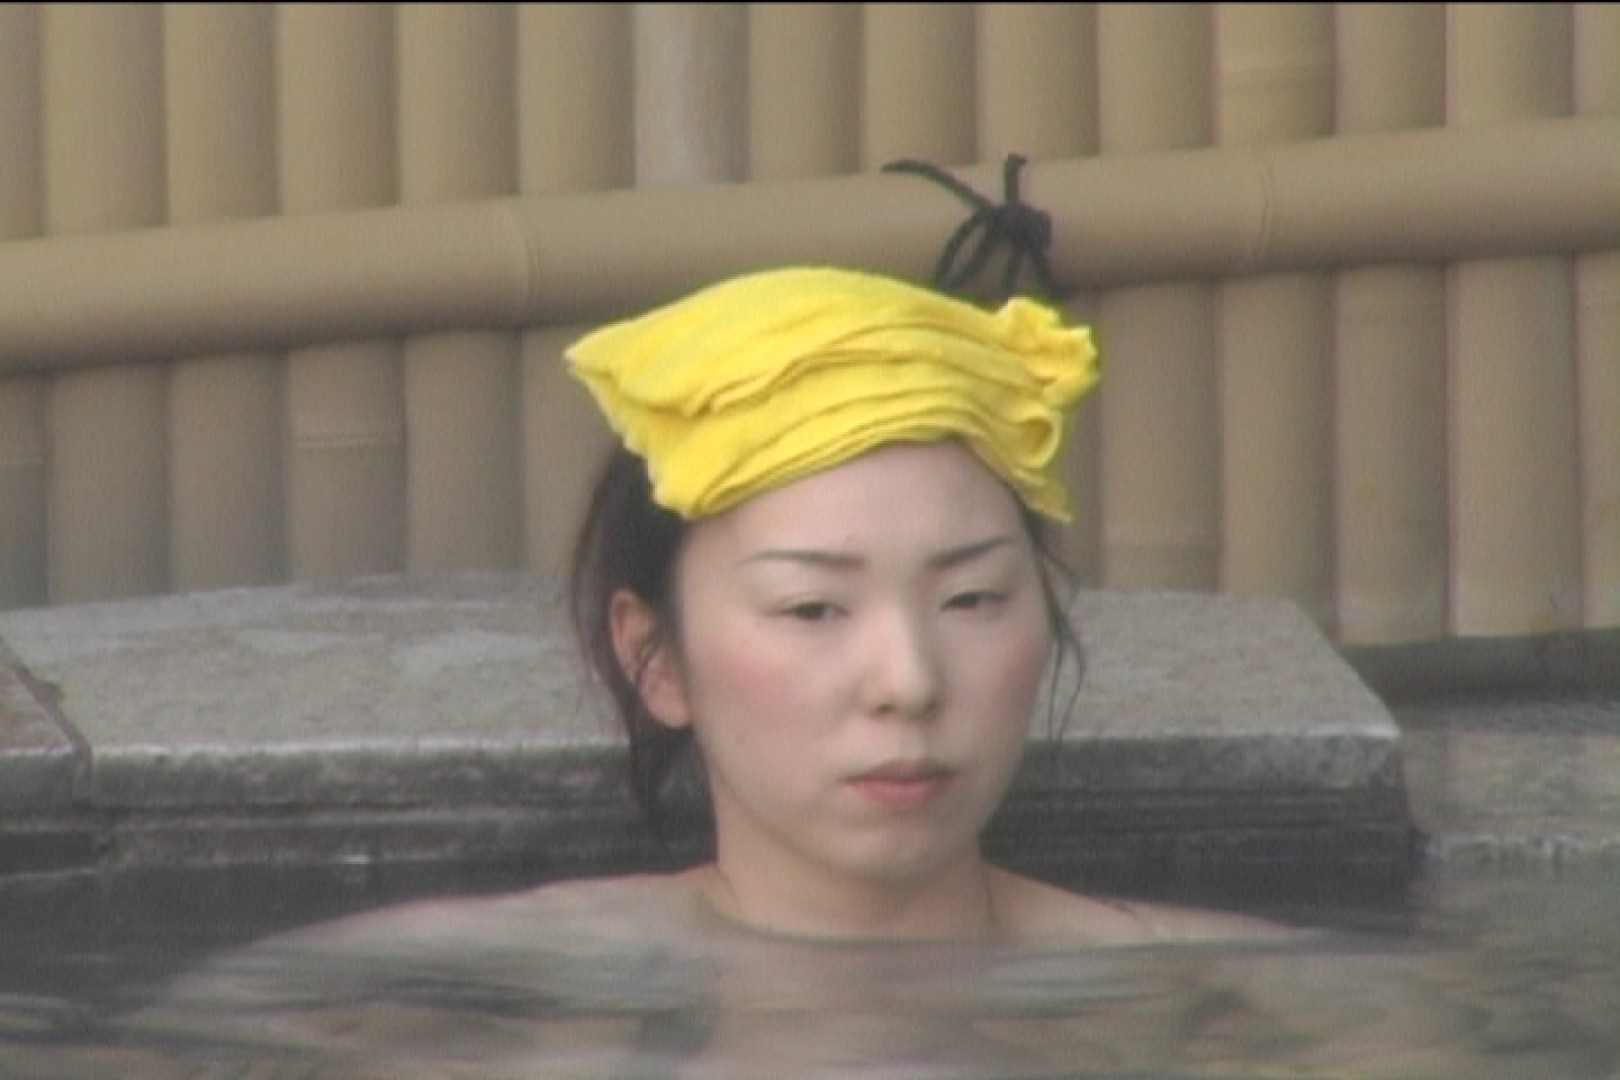 Aquaな露天風呂Vol.529 盗撮映像  51Pix 16